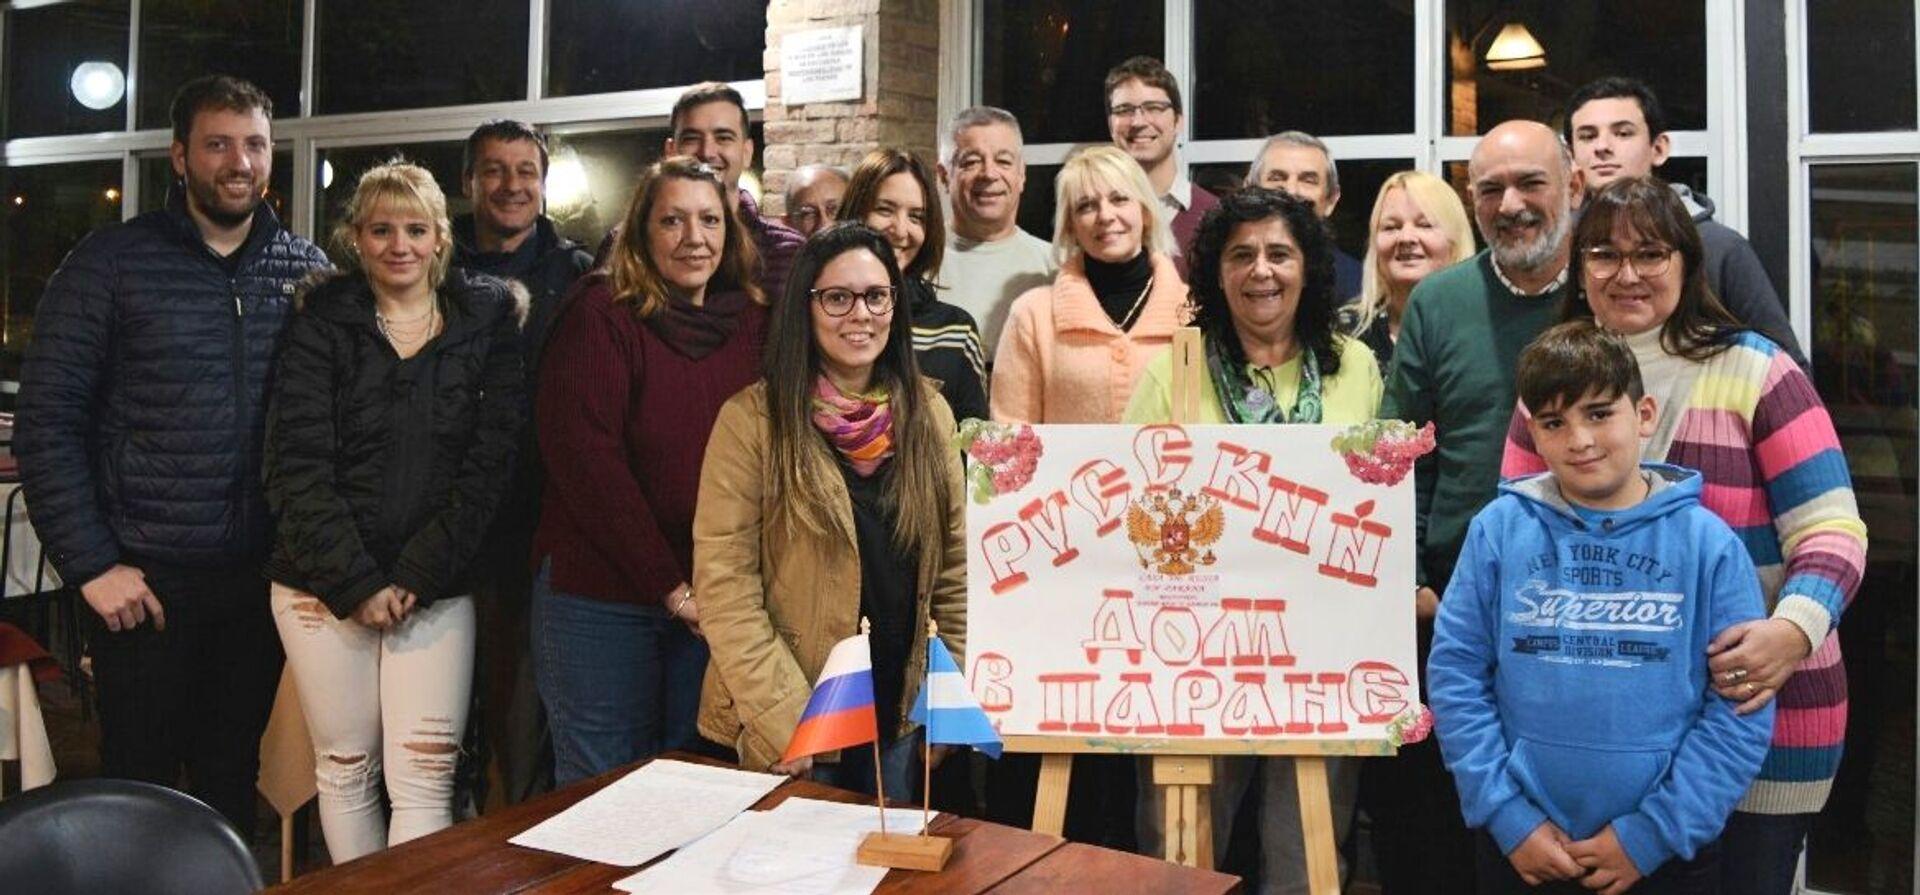 Integrantes de la Casa de Rusia de Paraná, Argentina  - Sputnik Mundo, 1920, 11.02.2021